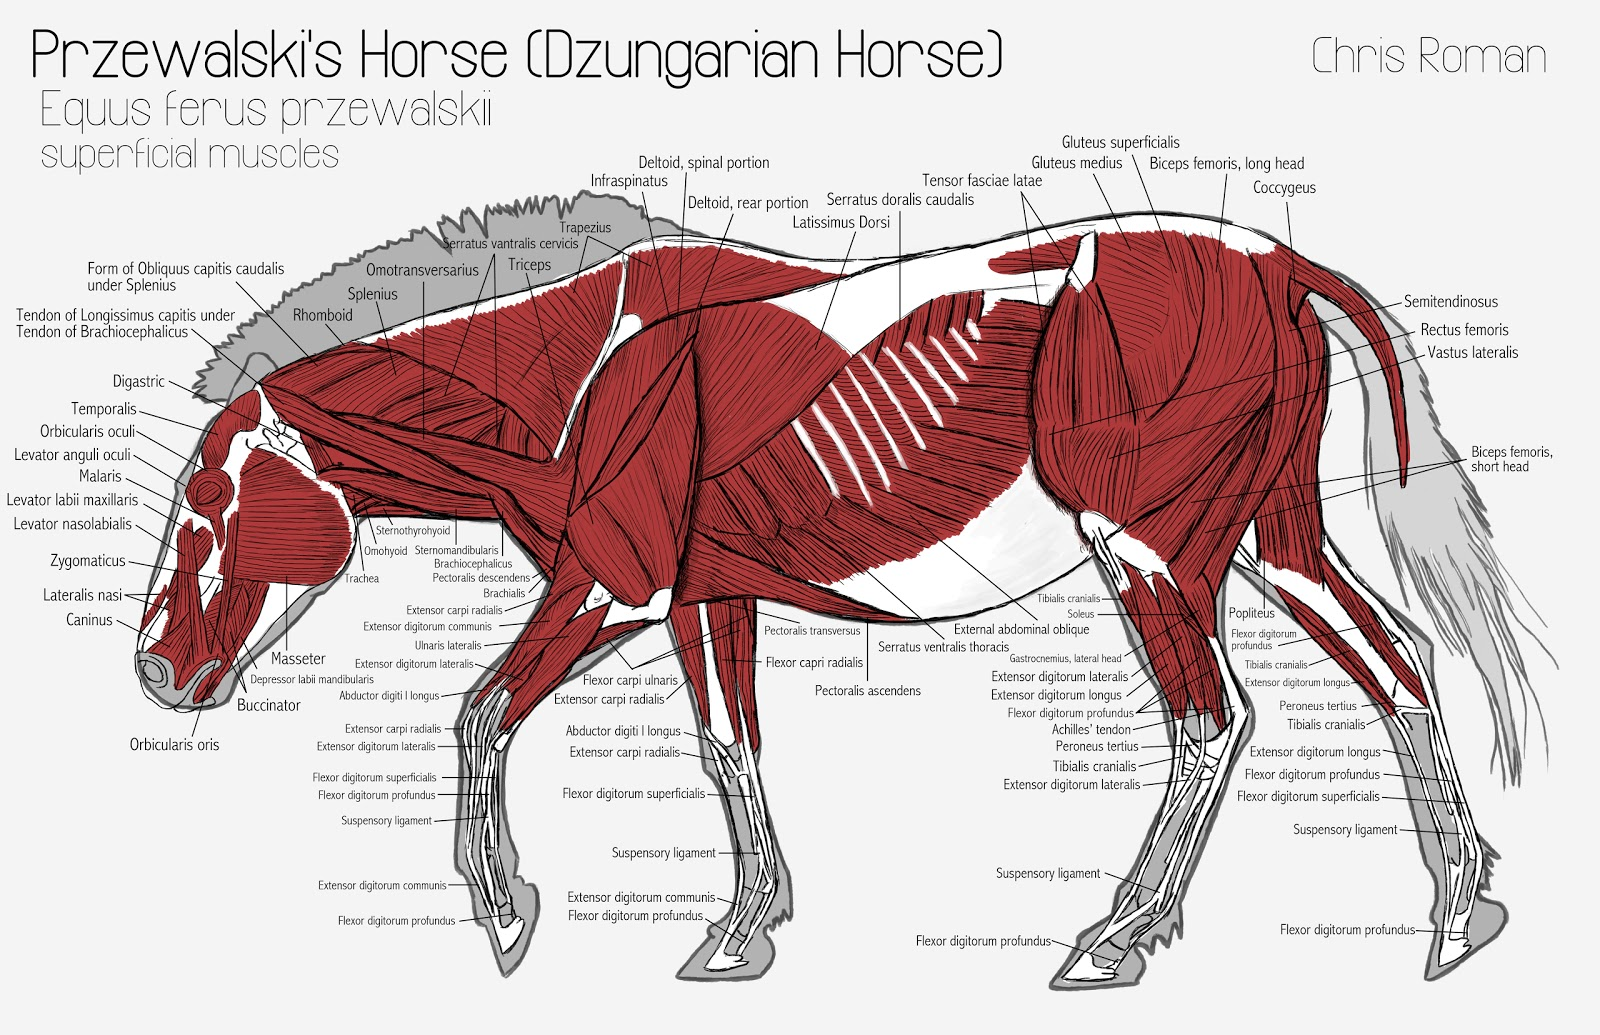 horse anatomy diagram muscles kenmore elite dishwasher wiring chris roman study